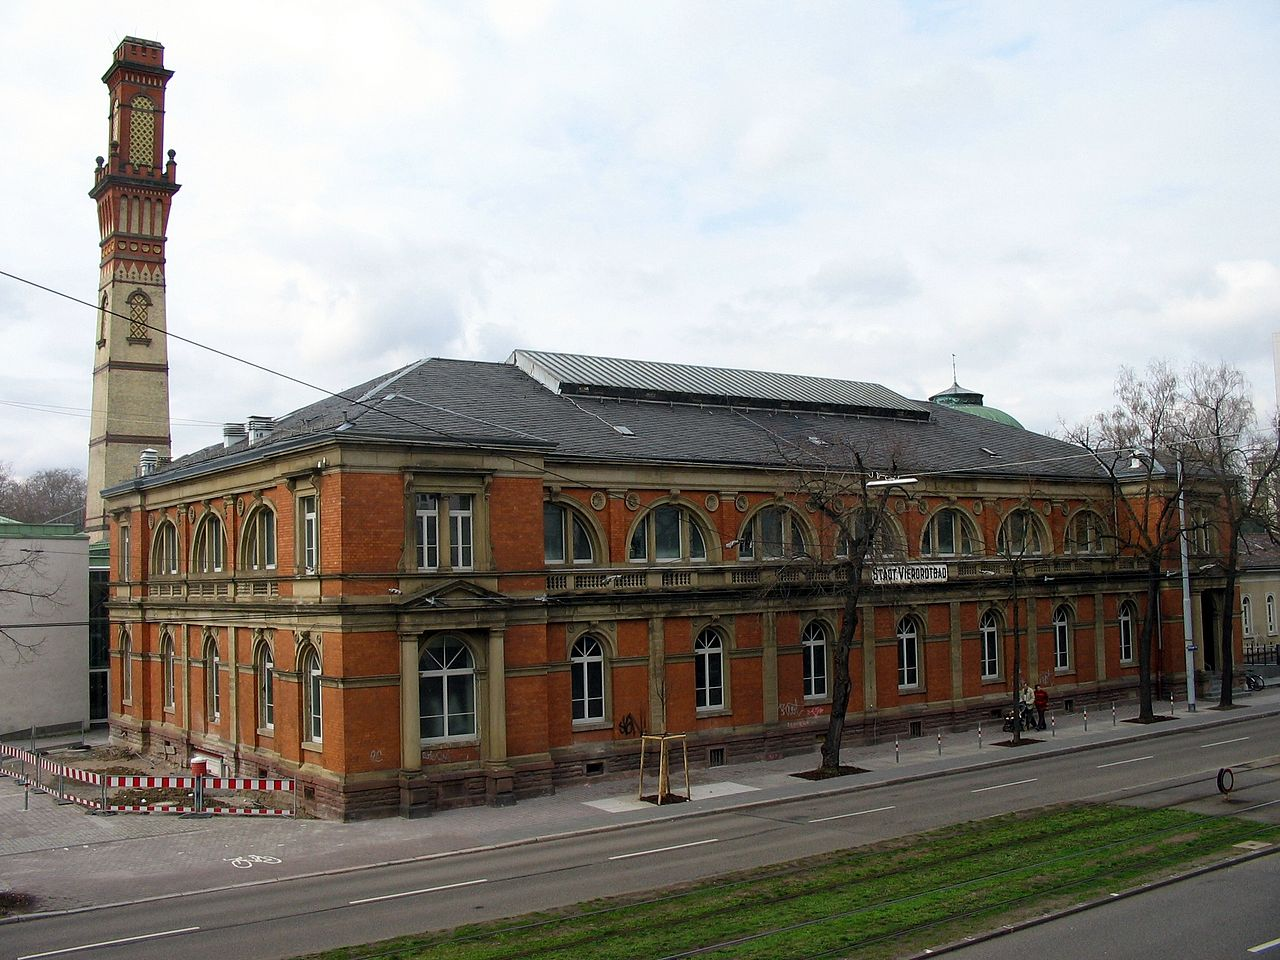 Bild Vierordtbad Karlsruhe